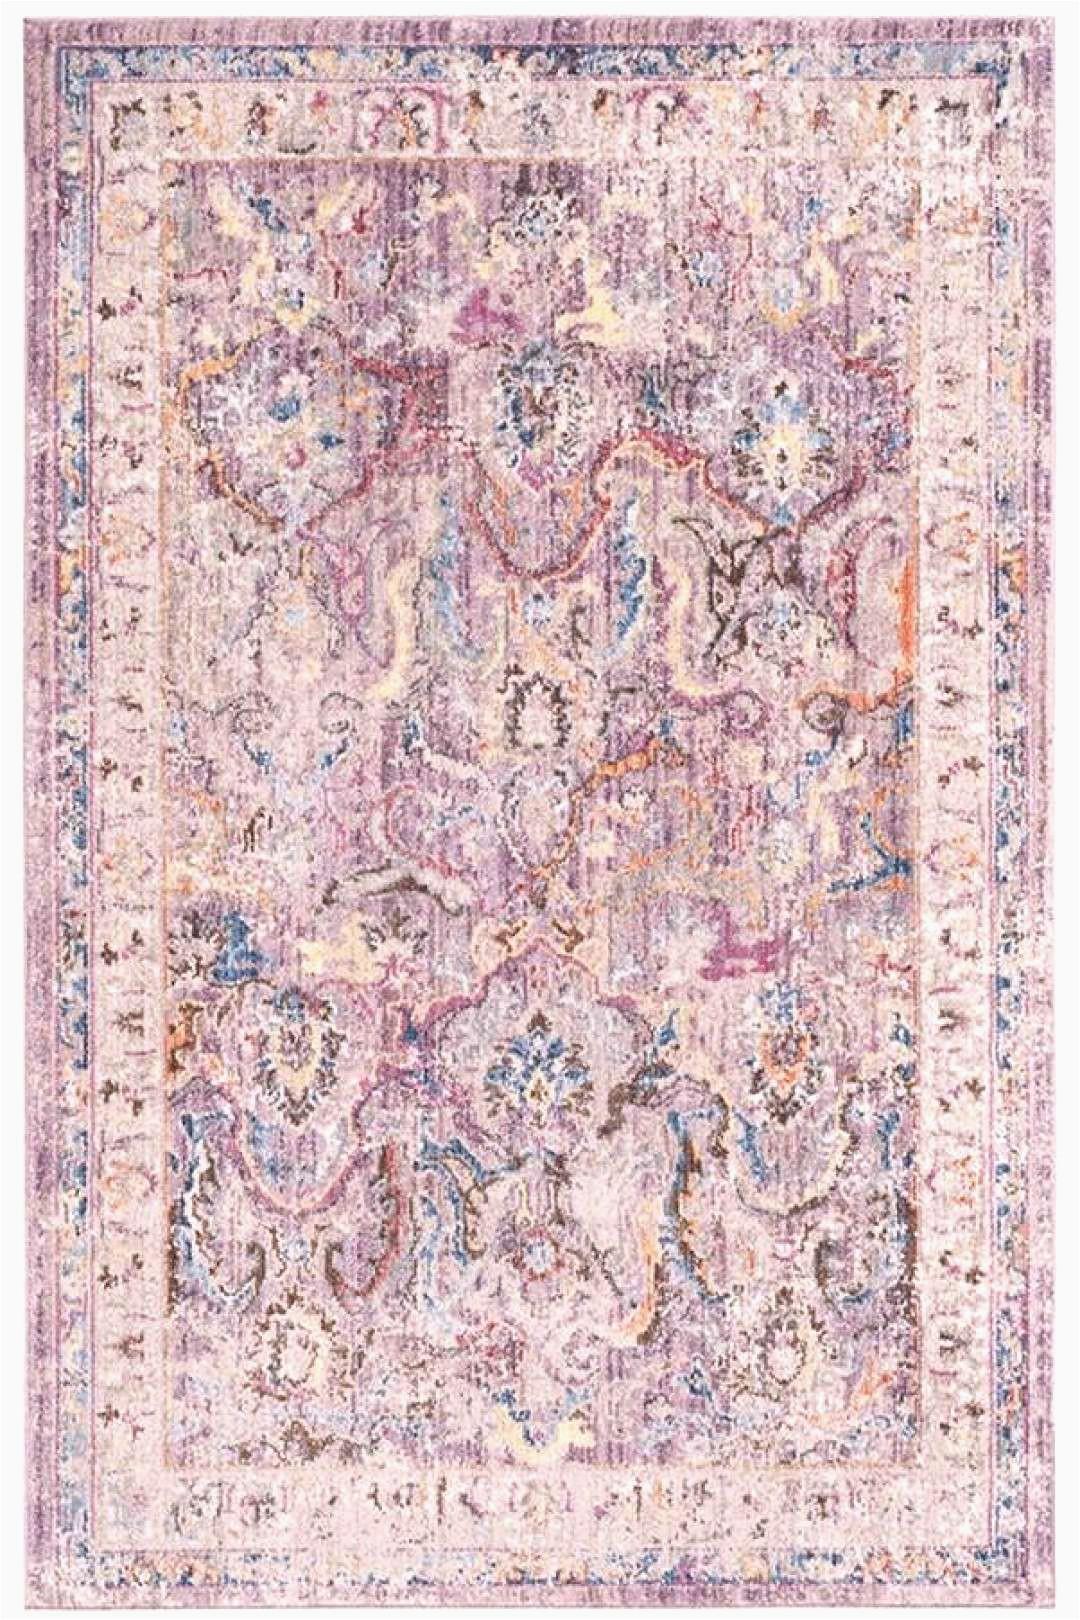 safavieh bristol lavender and light gray 4 x 6 area rug reviews rugs macysarea